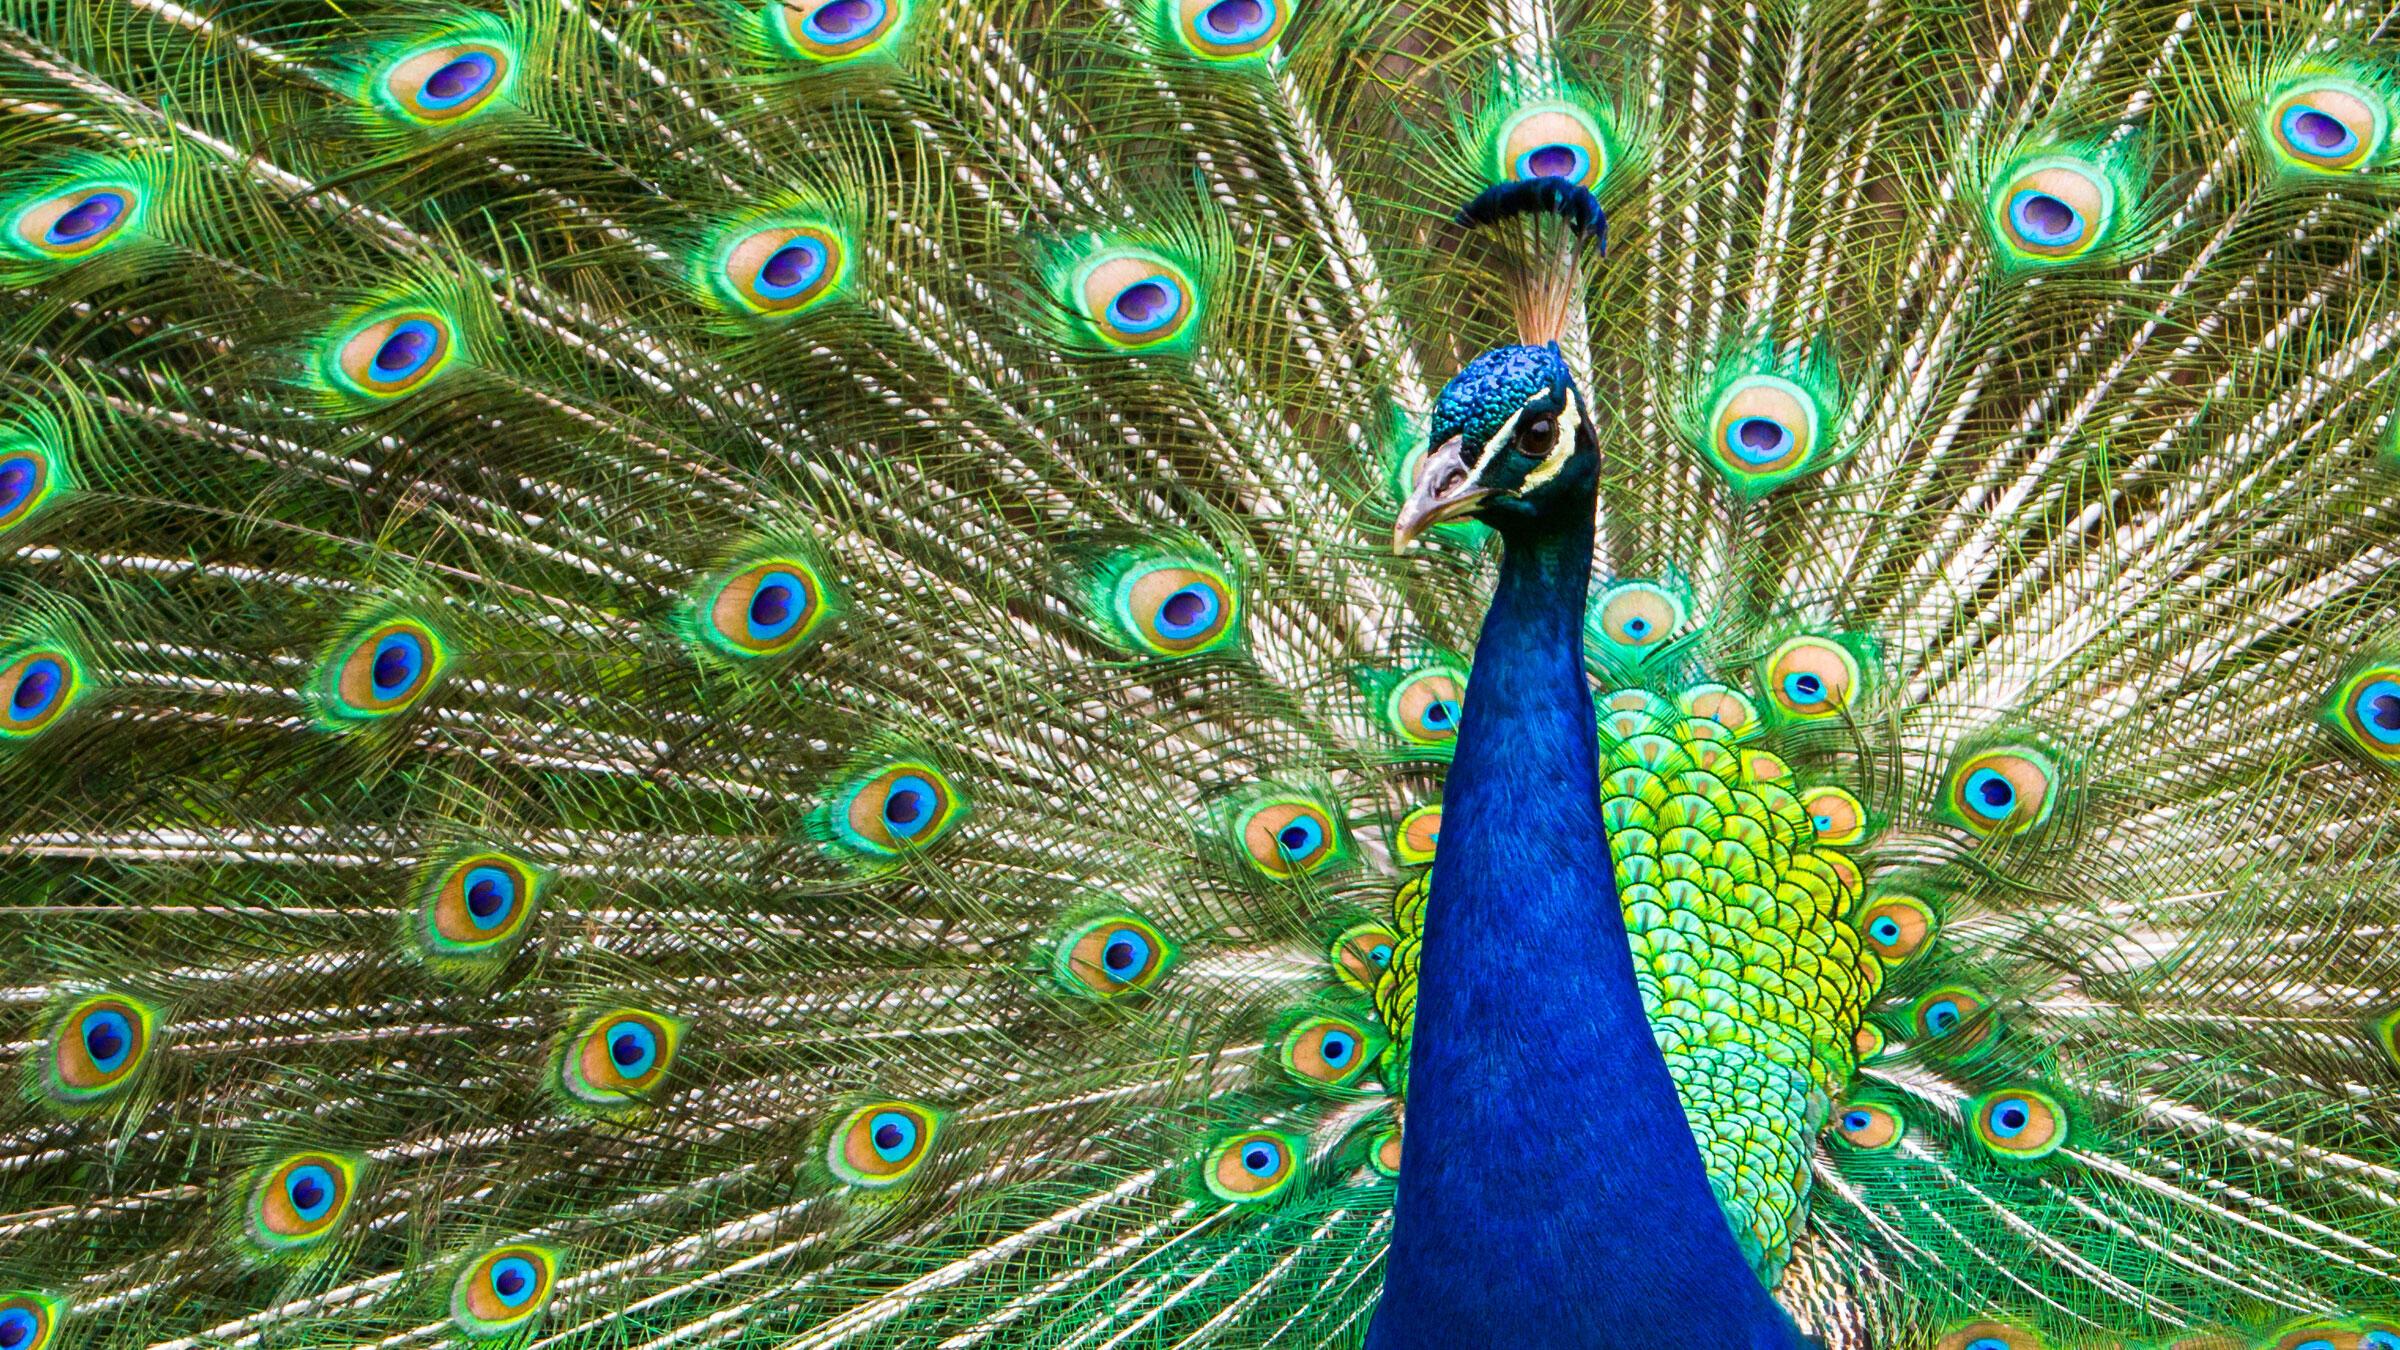 Peafowl. Jason Mrachina/Flickr Creative Commons